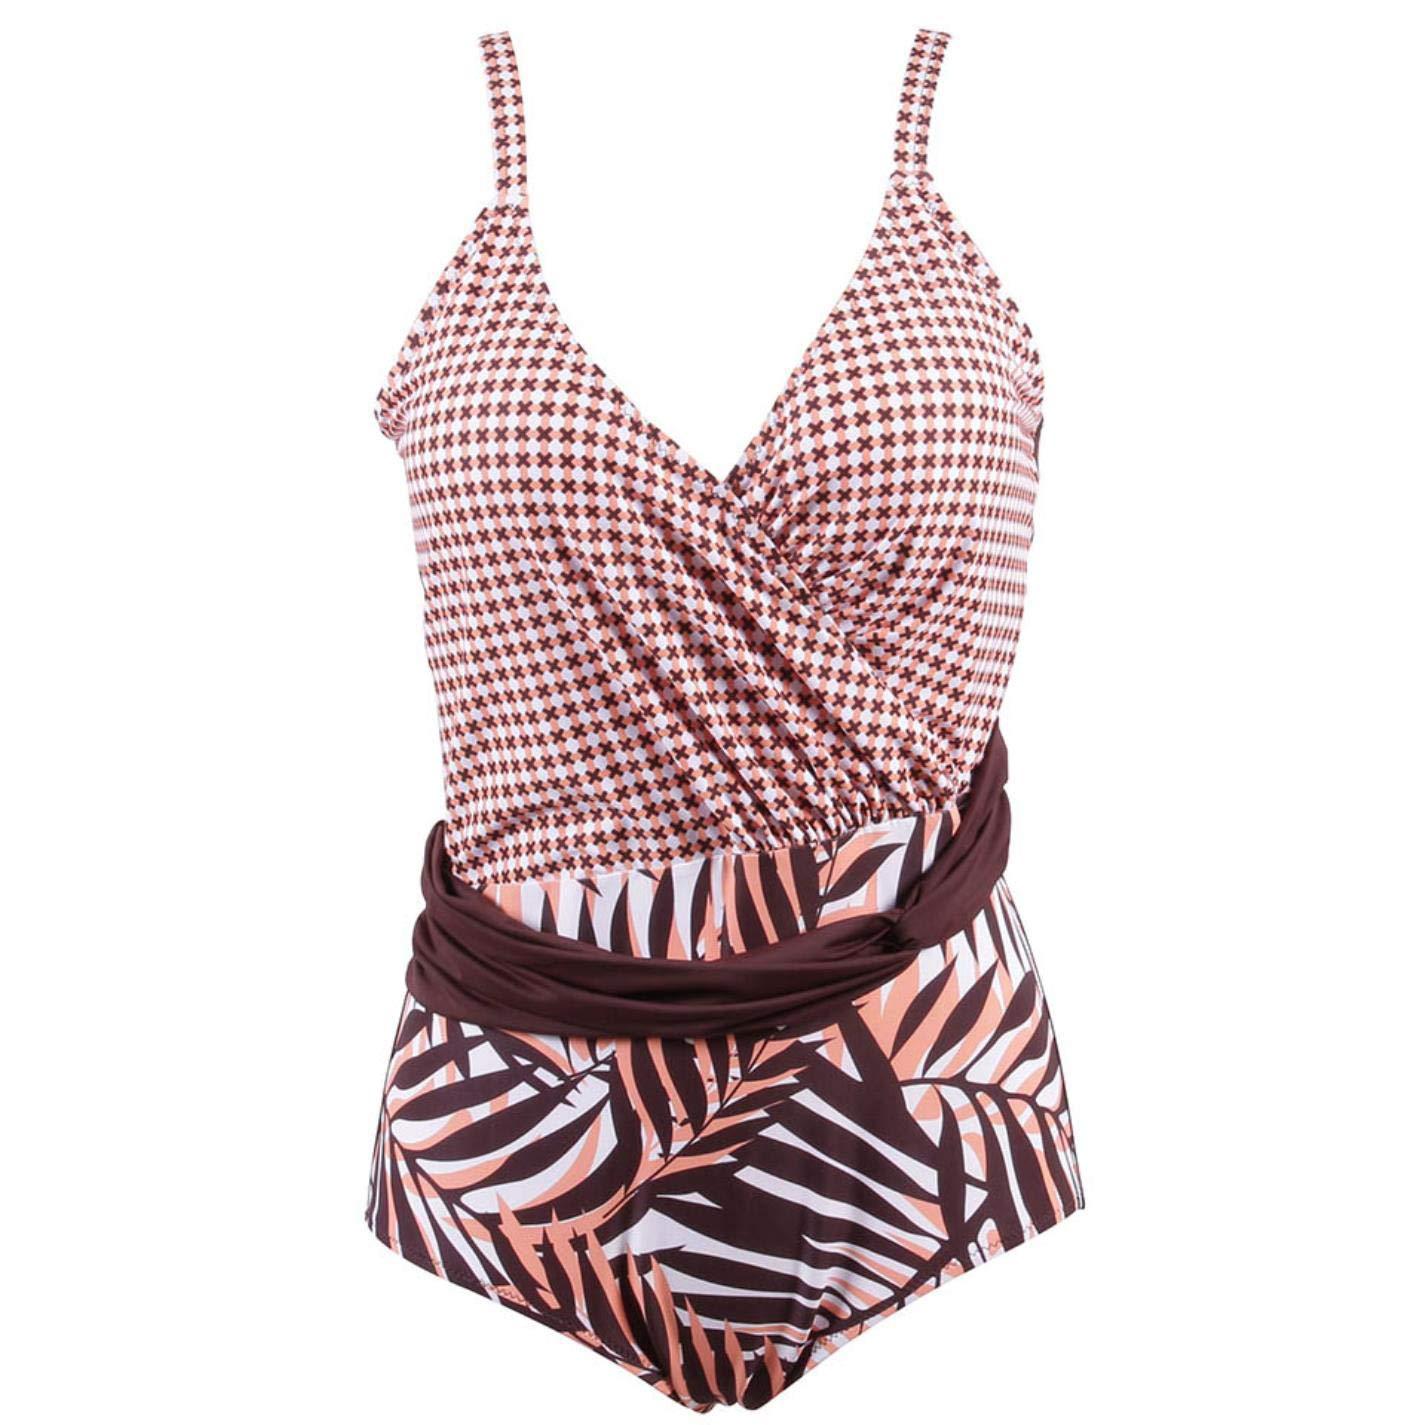 QVKis Women Plus Size Swimwear Retro Print One Piece Swimsuit